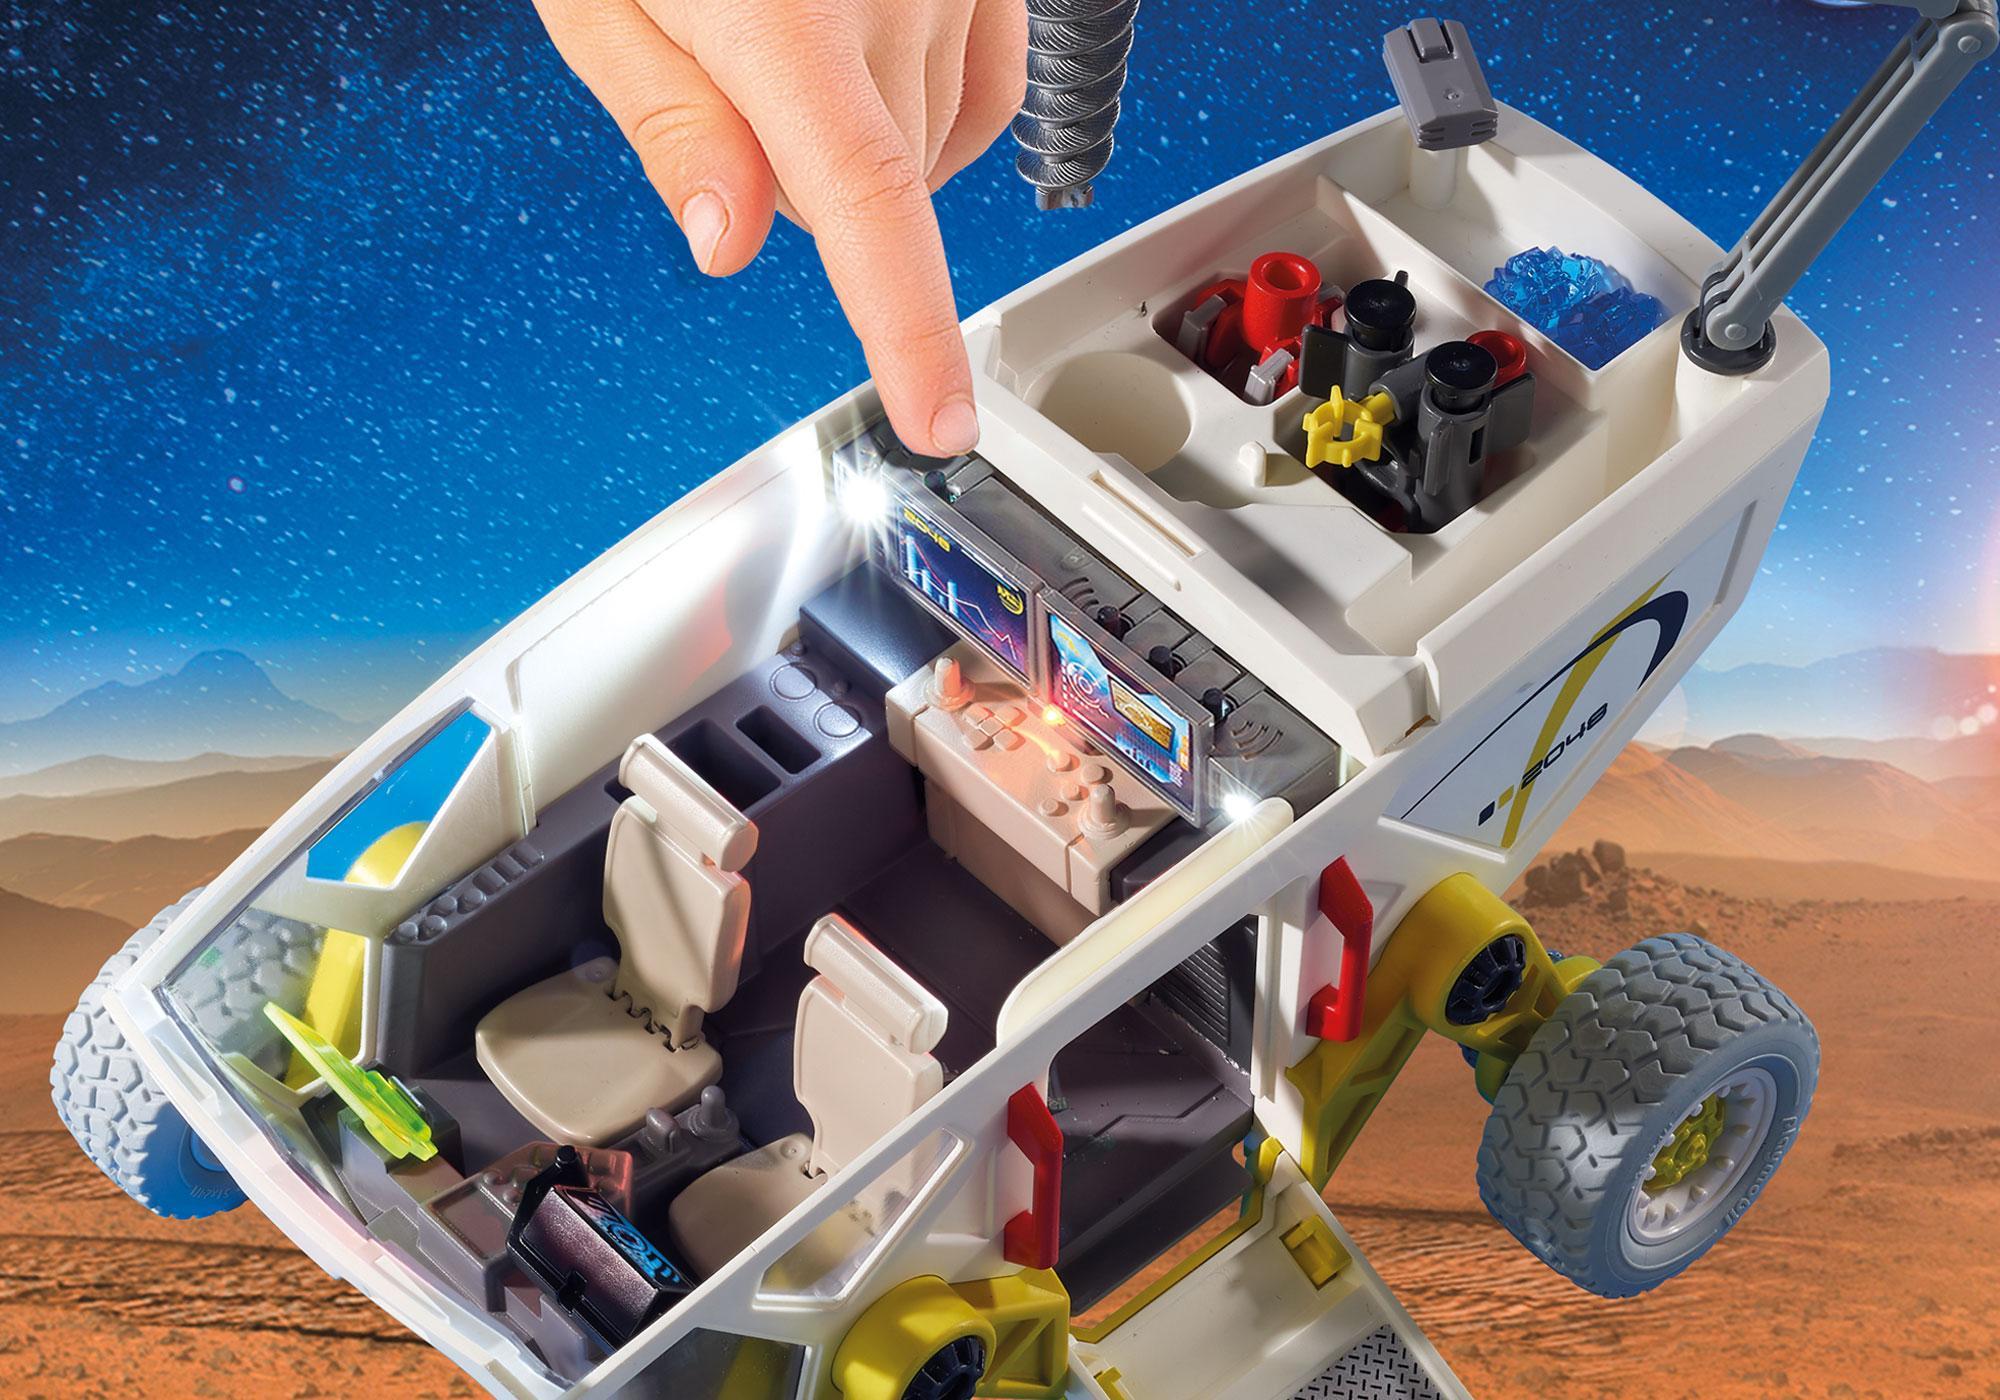 http://media.playmobil.com/i/playmobil/9489_product_extra2/Διαστημικό όχημα εξερεύνησης